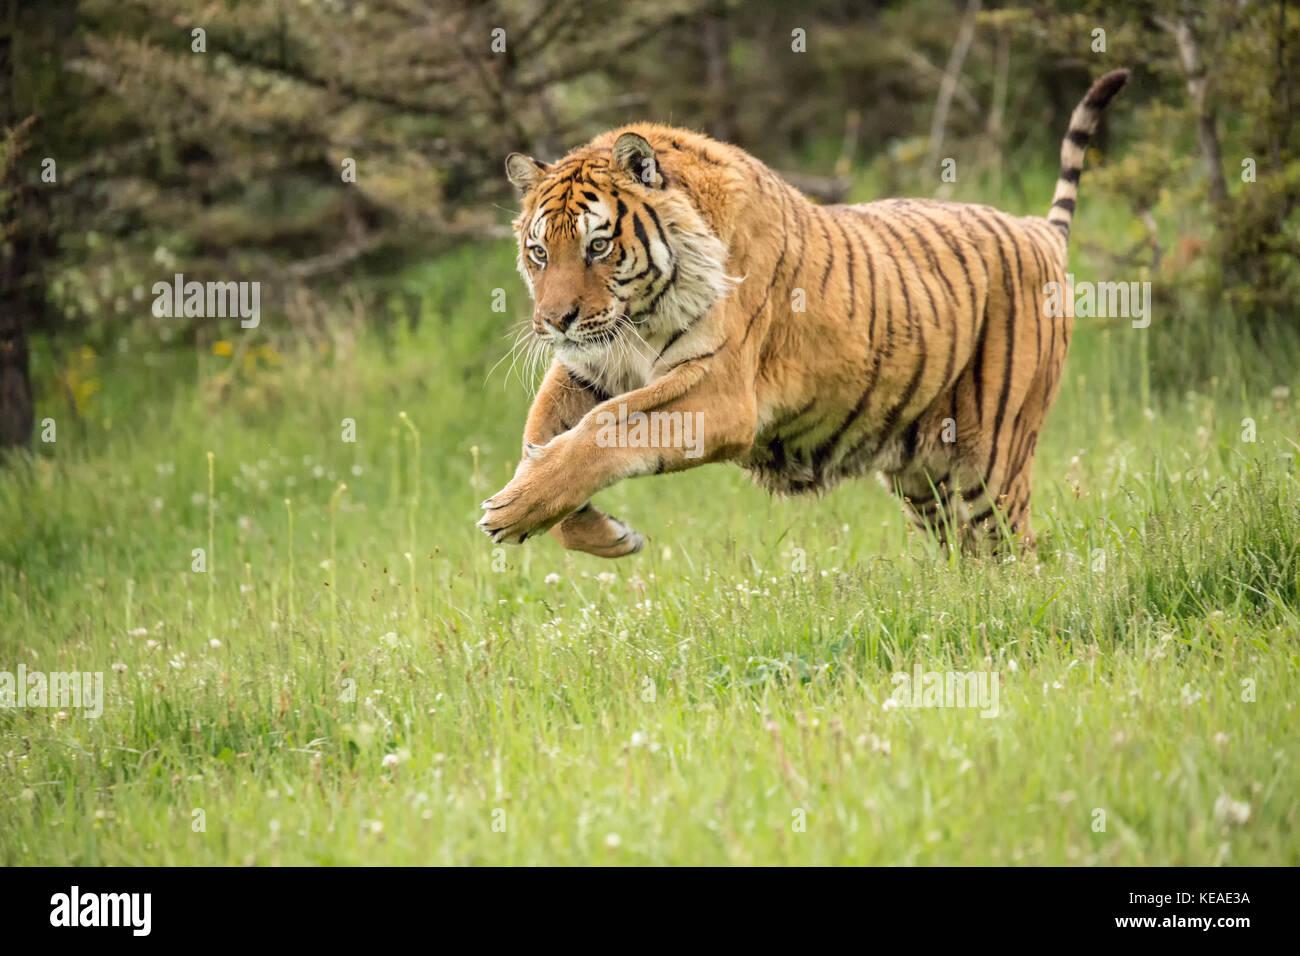 Tiger facts photos and videos siberian tiger bengal